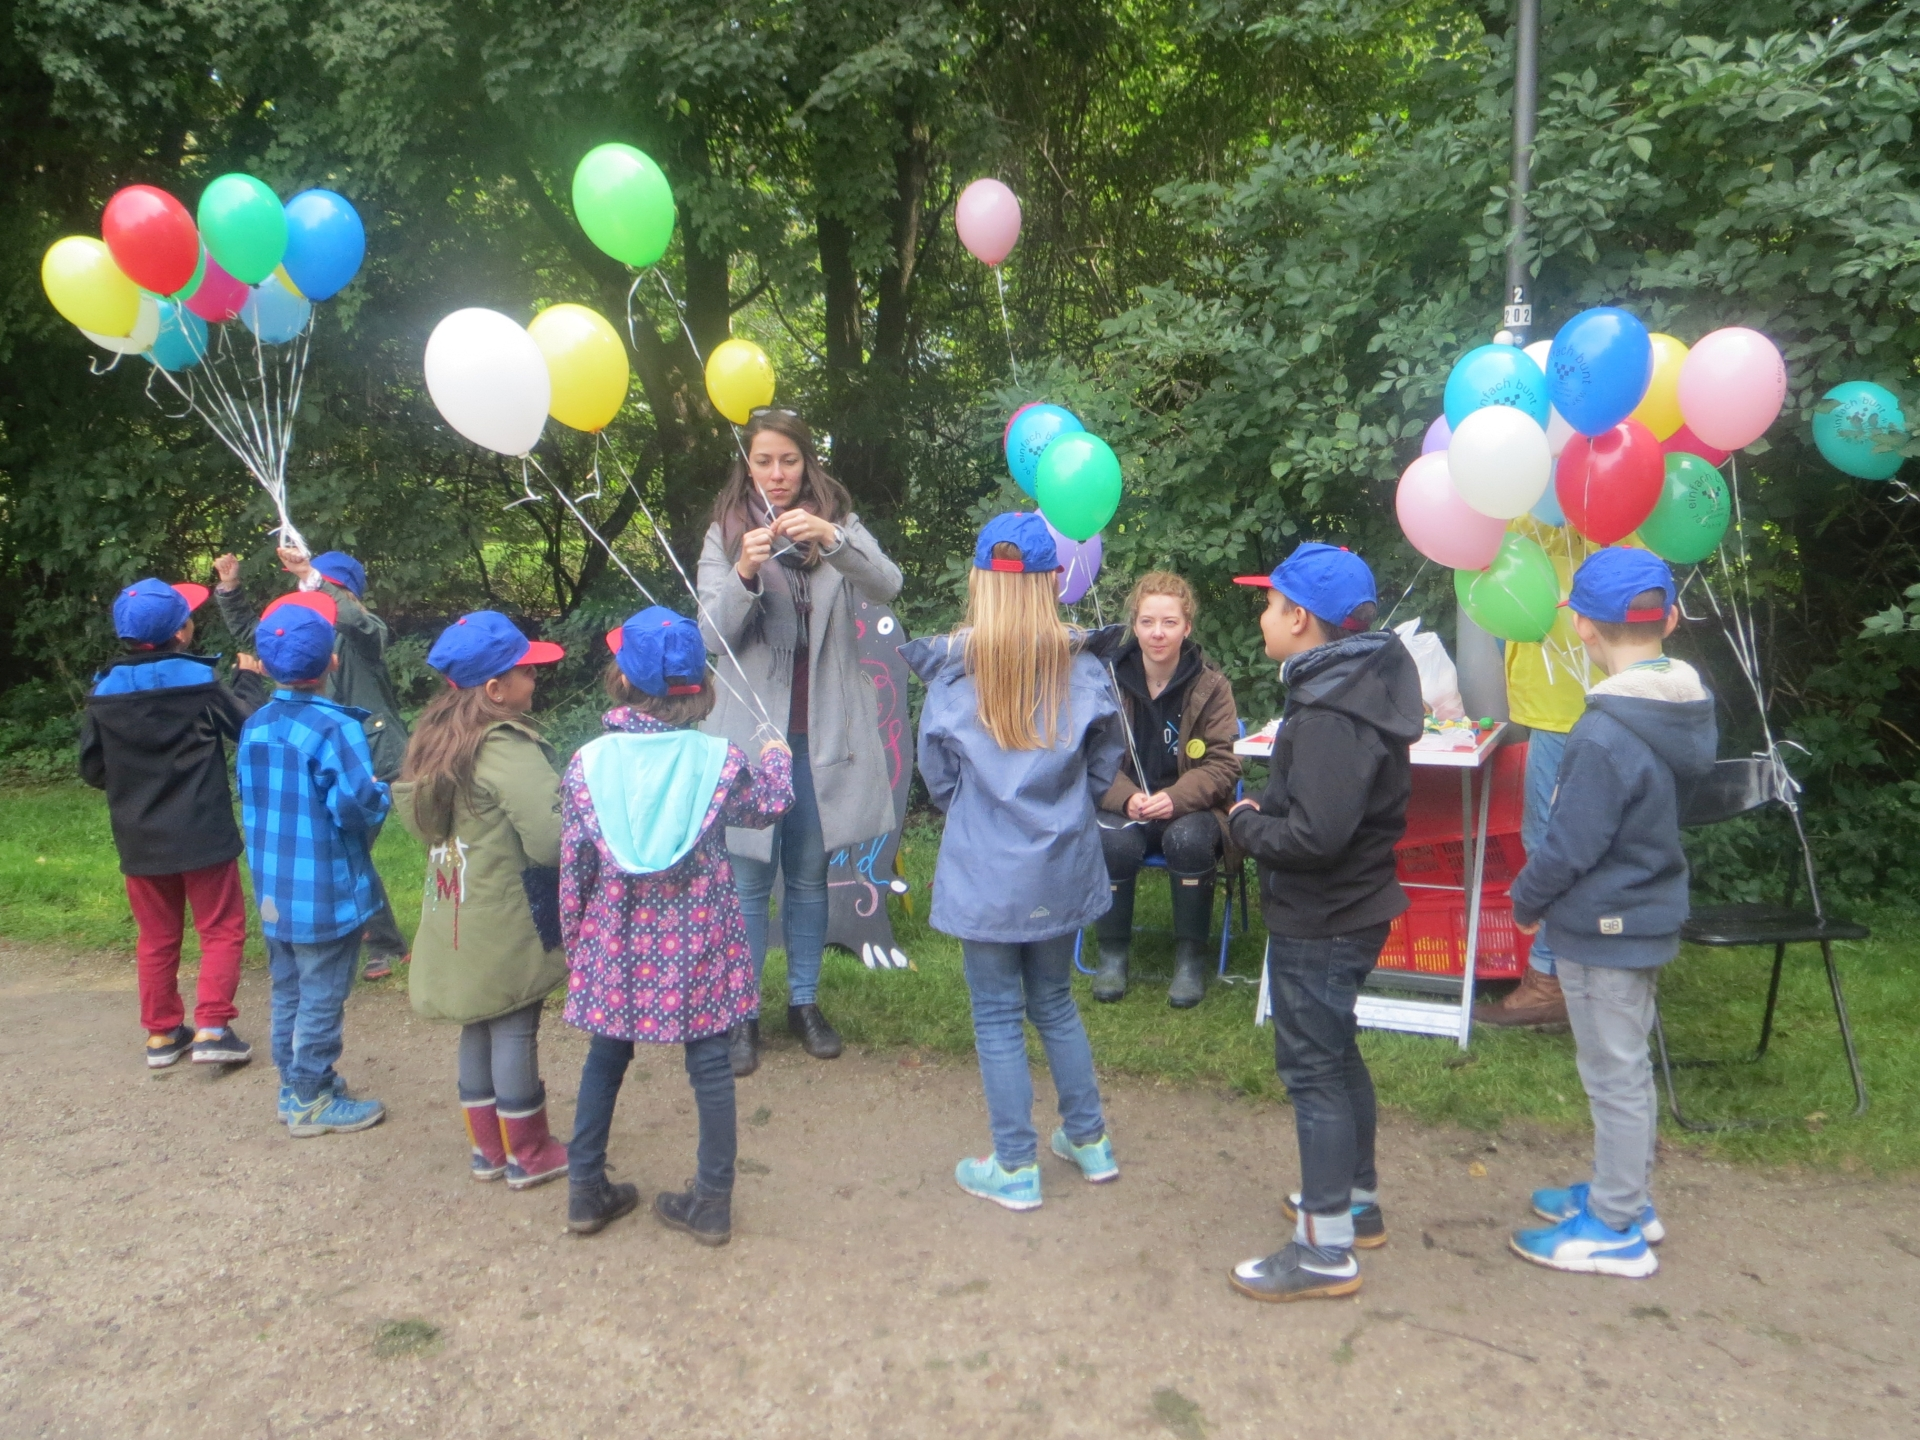 Weltkindertag2017_JKW_Ballons_02